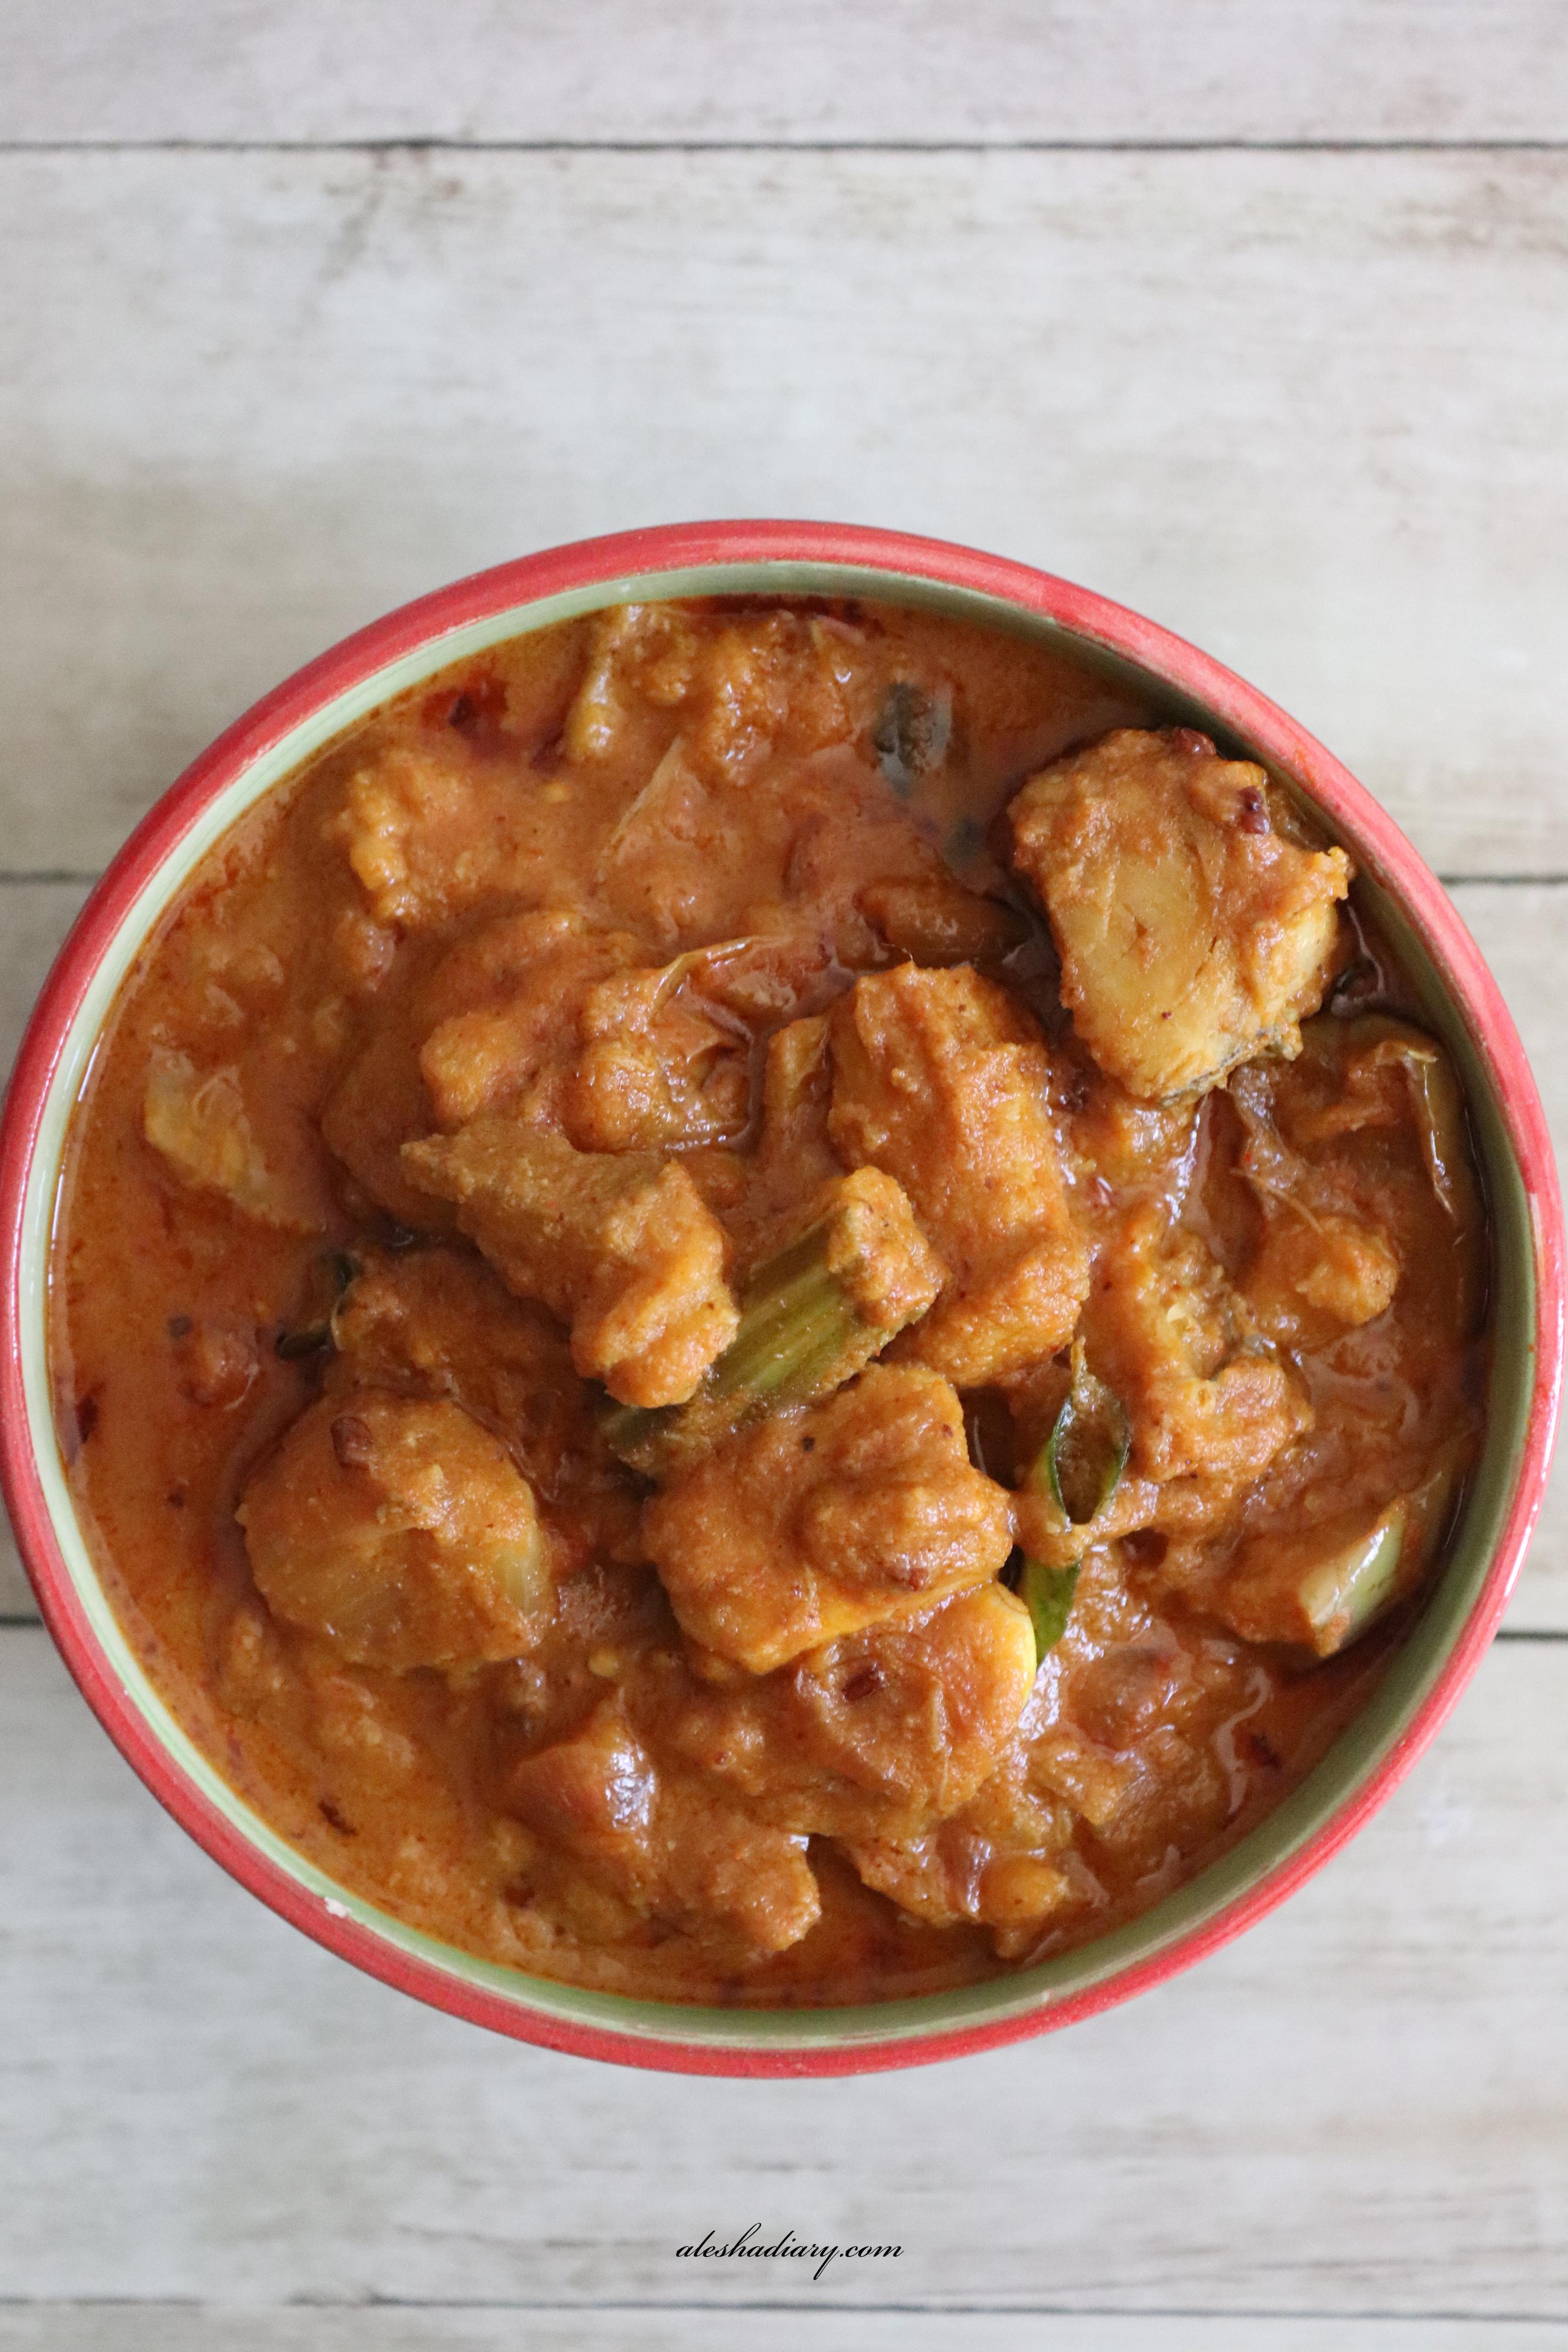 Dry fish with veggies curry – Sheela Karuvattu kuzhambu – Kai potta Karuvadu kulambu